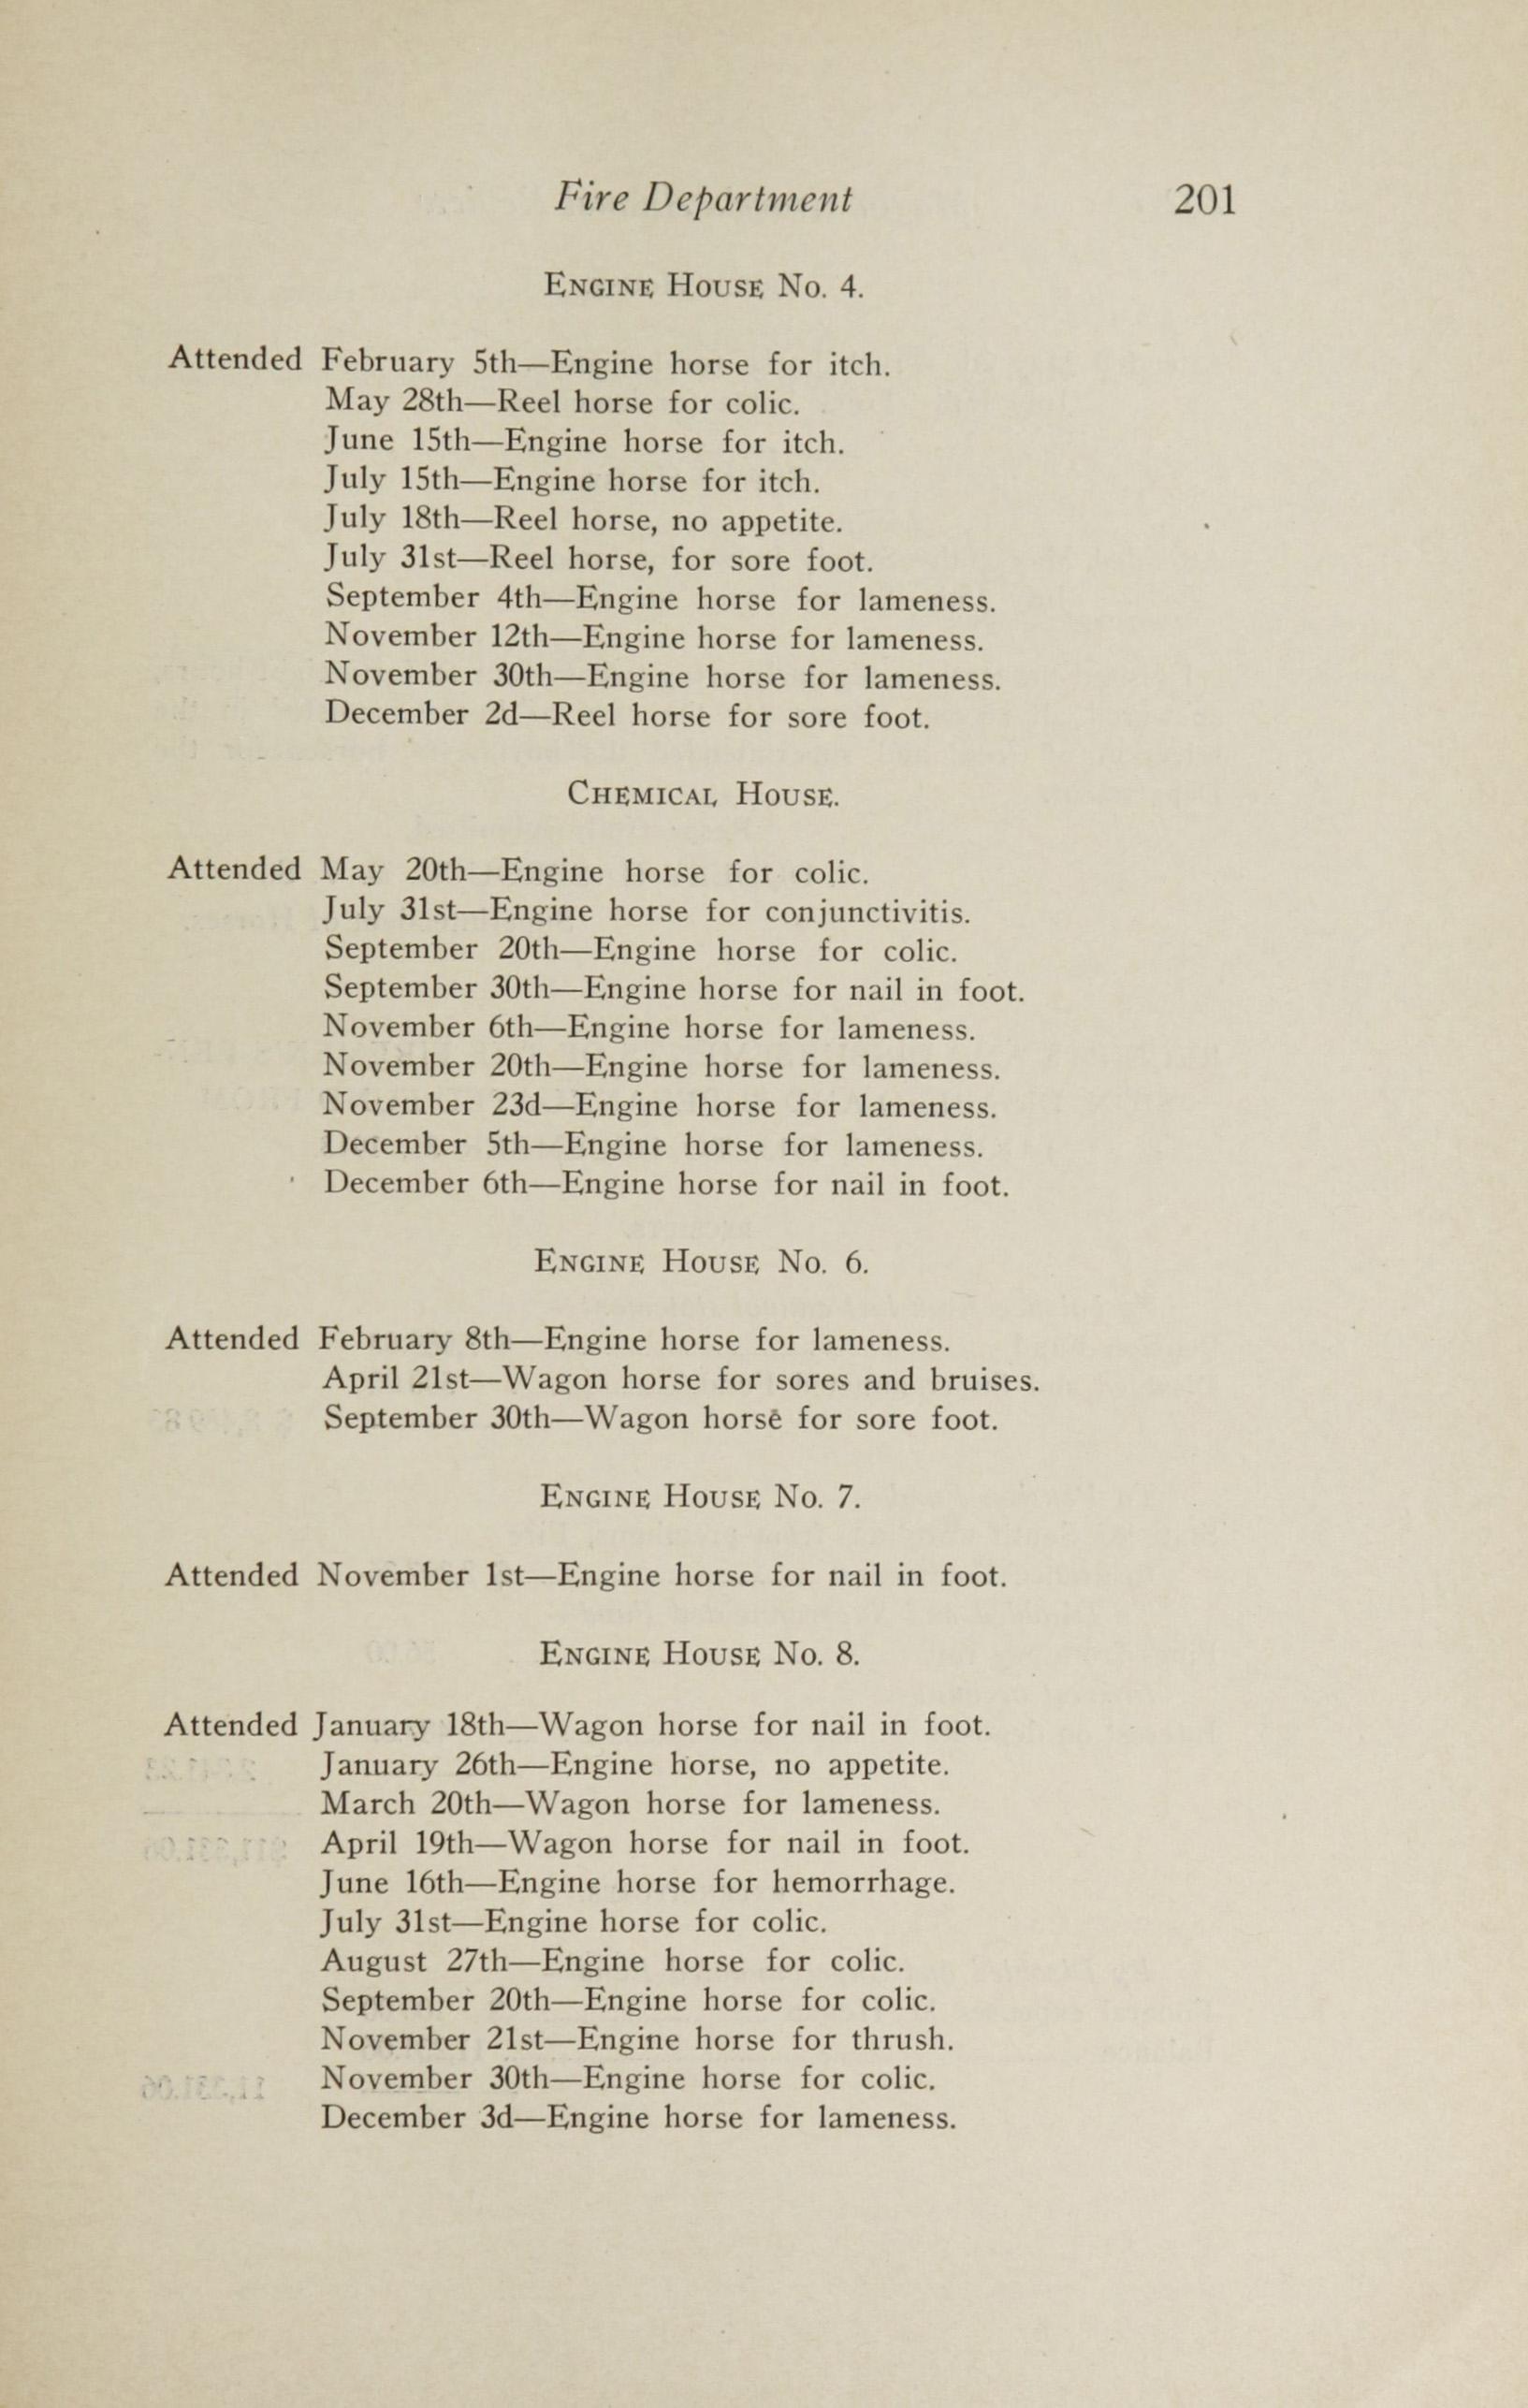 Charleston Yearbook, 1913, page 201